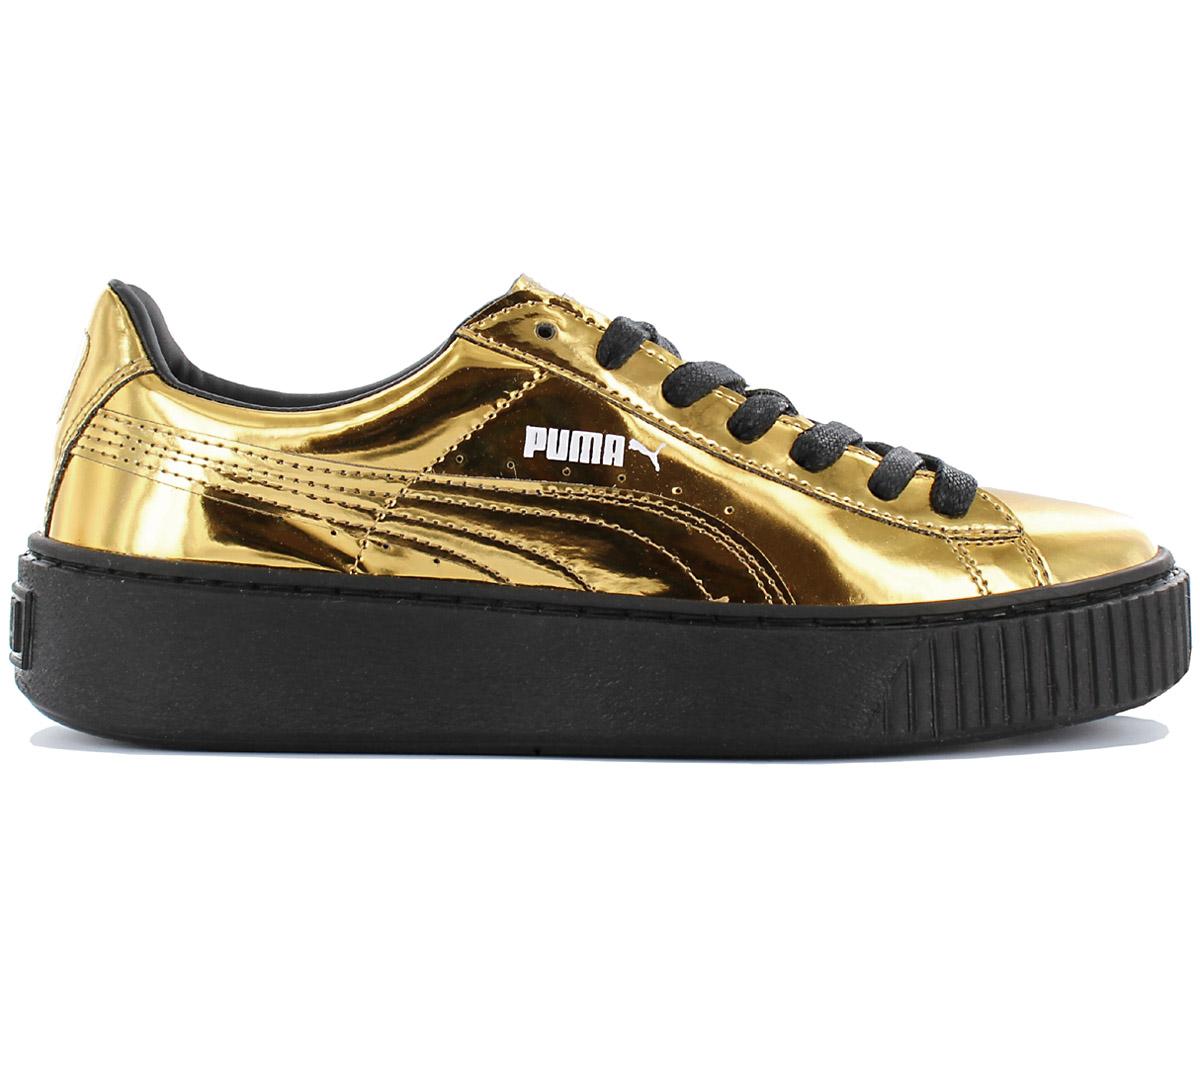 Puma Basket Platform Damen Sneaker Plateau Schuhe Freizeit Turnschuhe hohe Sohle